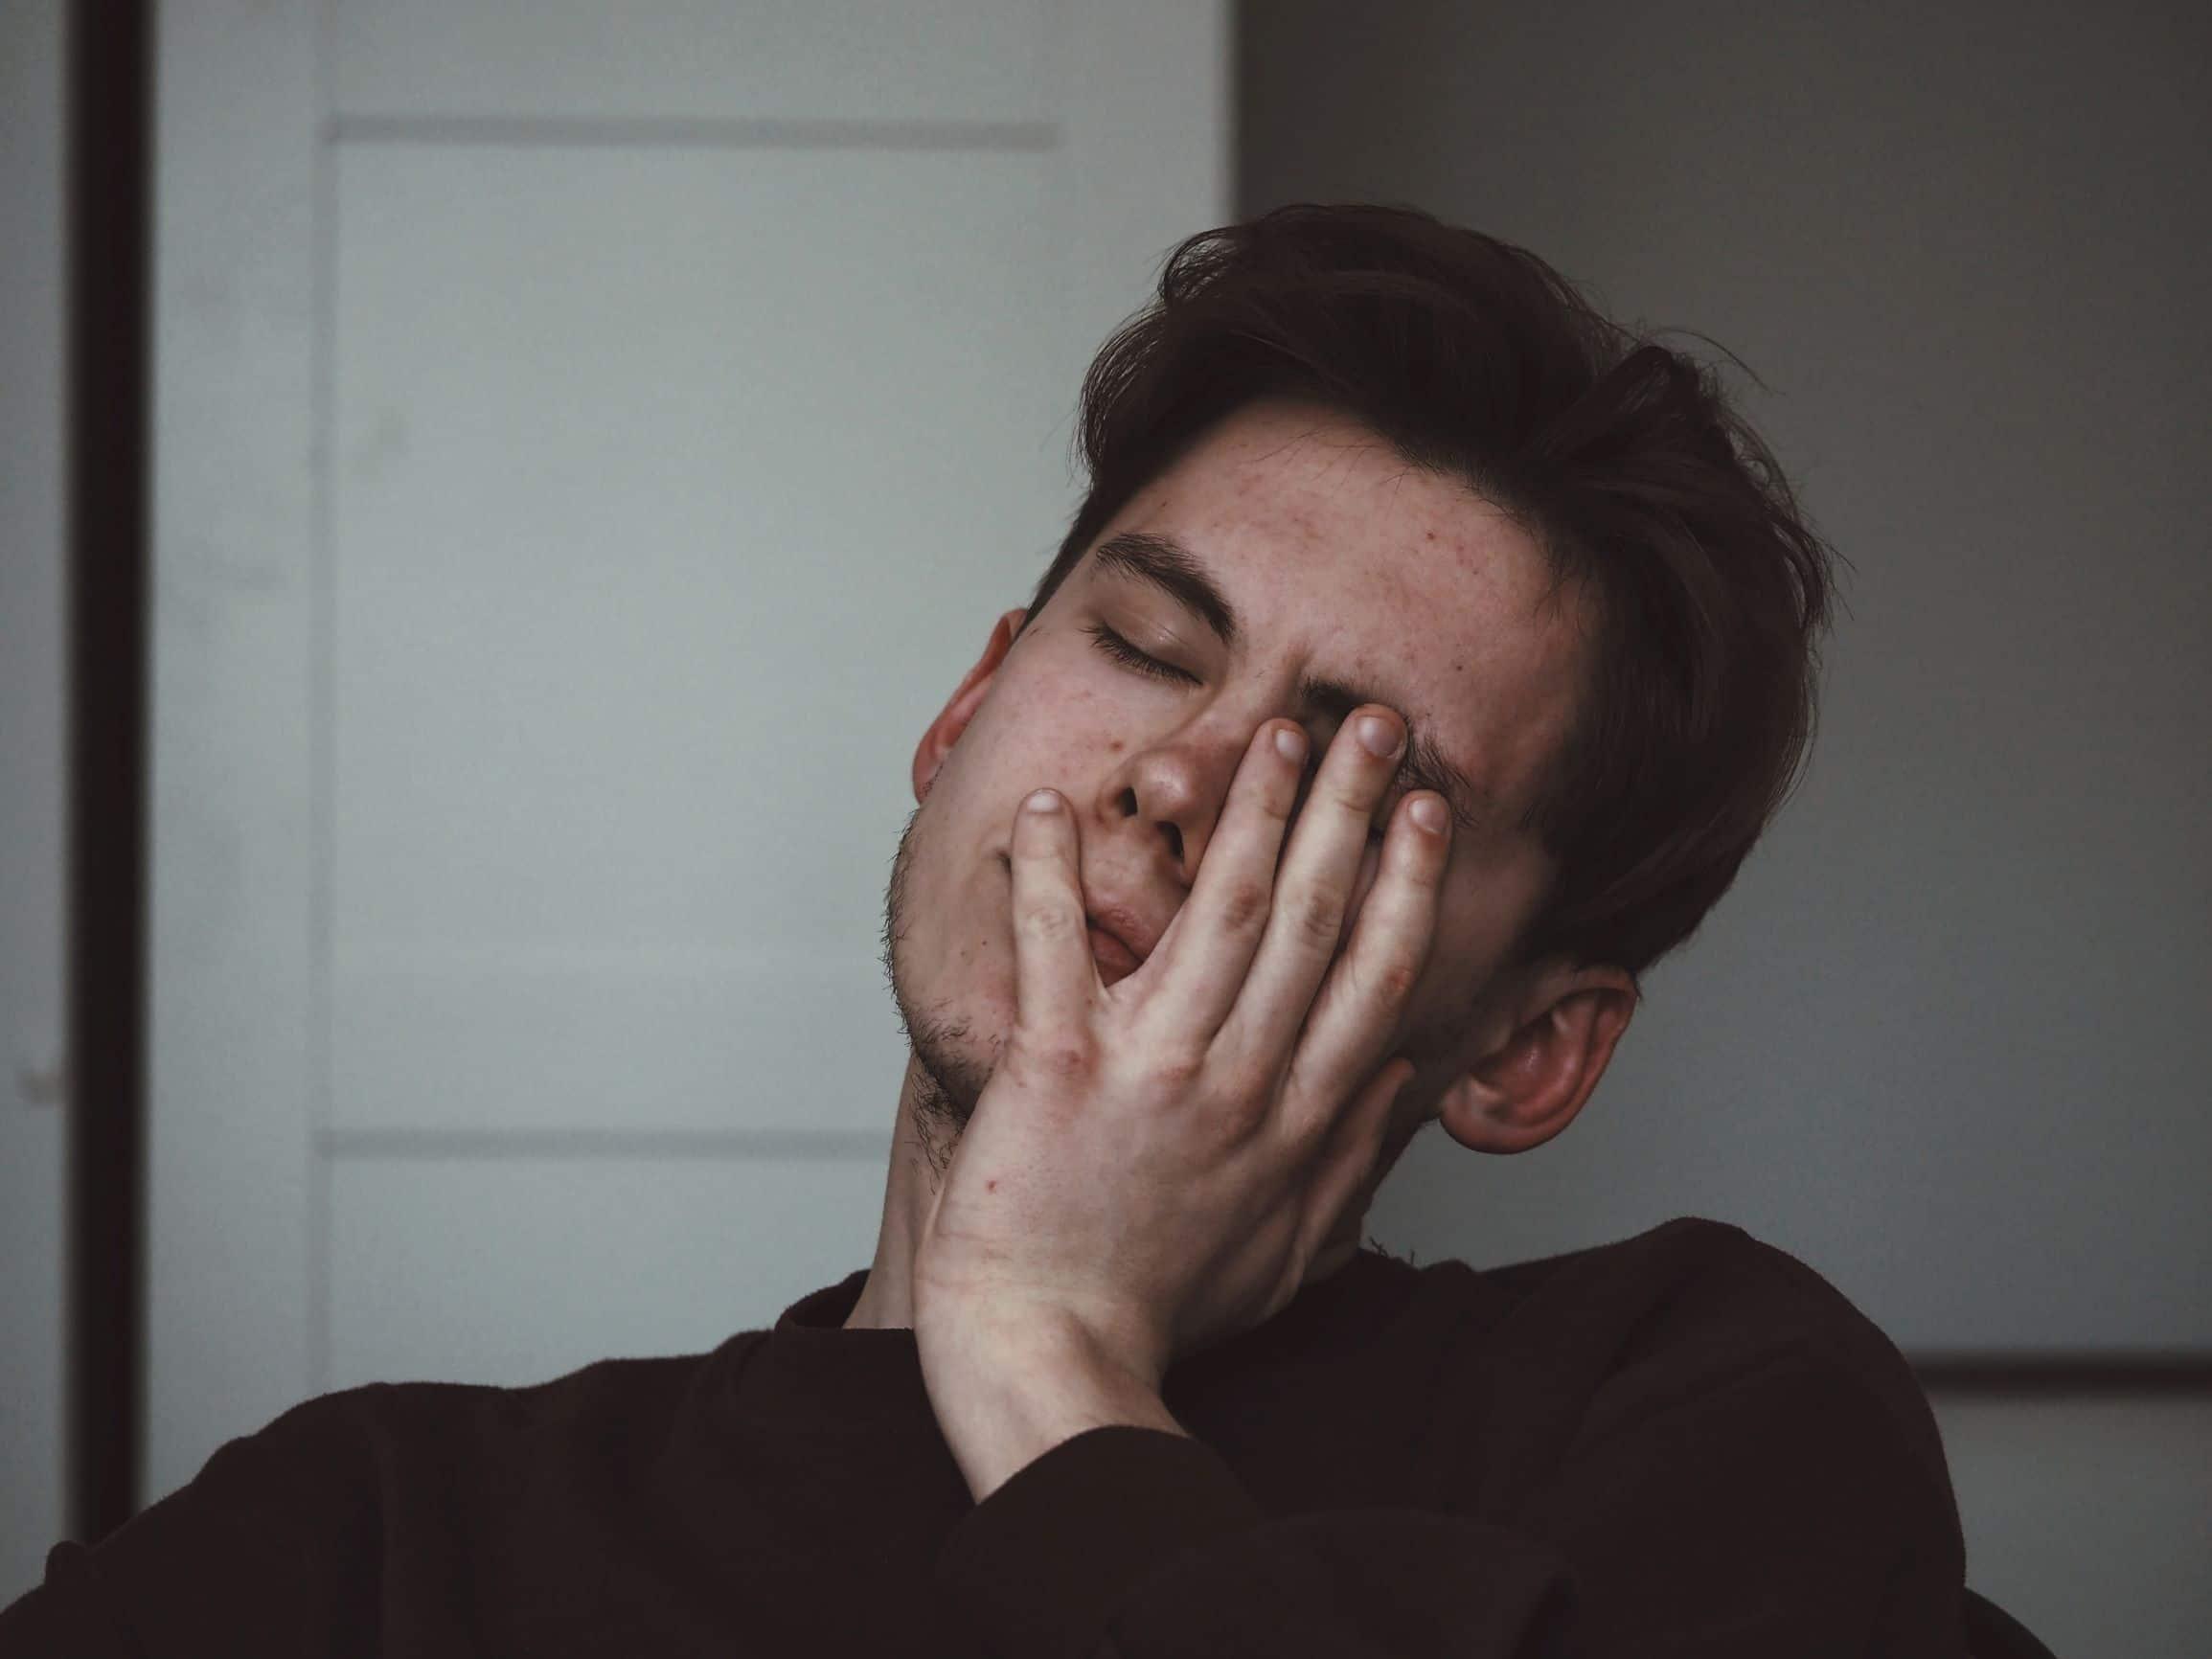 headaches making it difficult to sleep